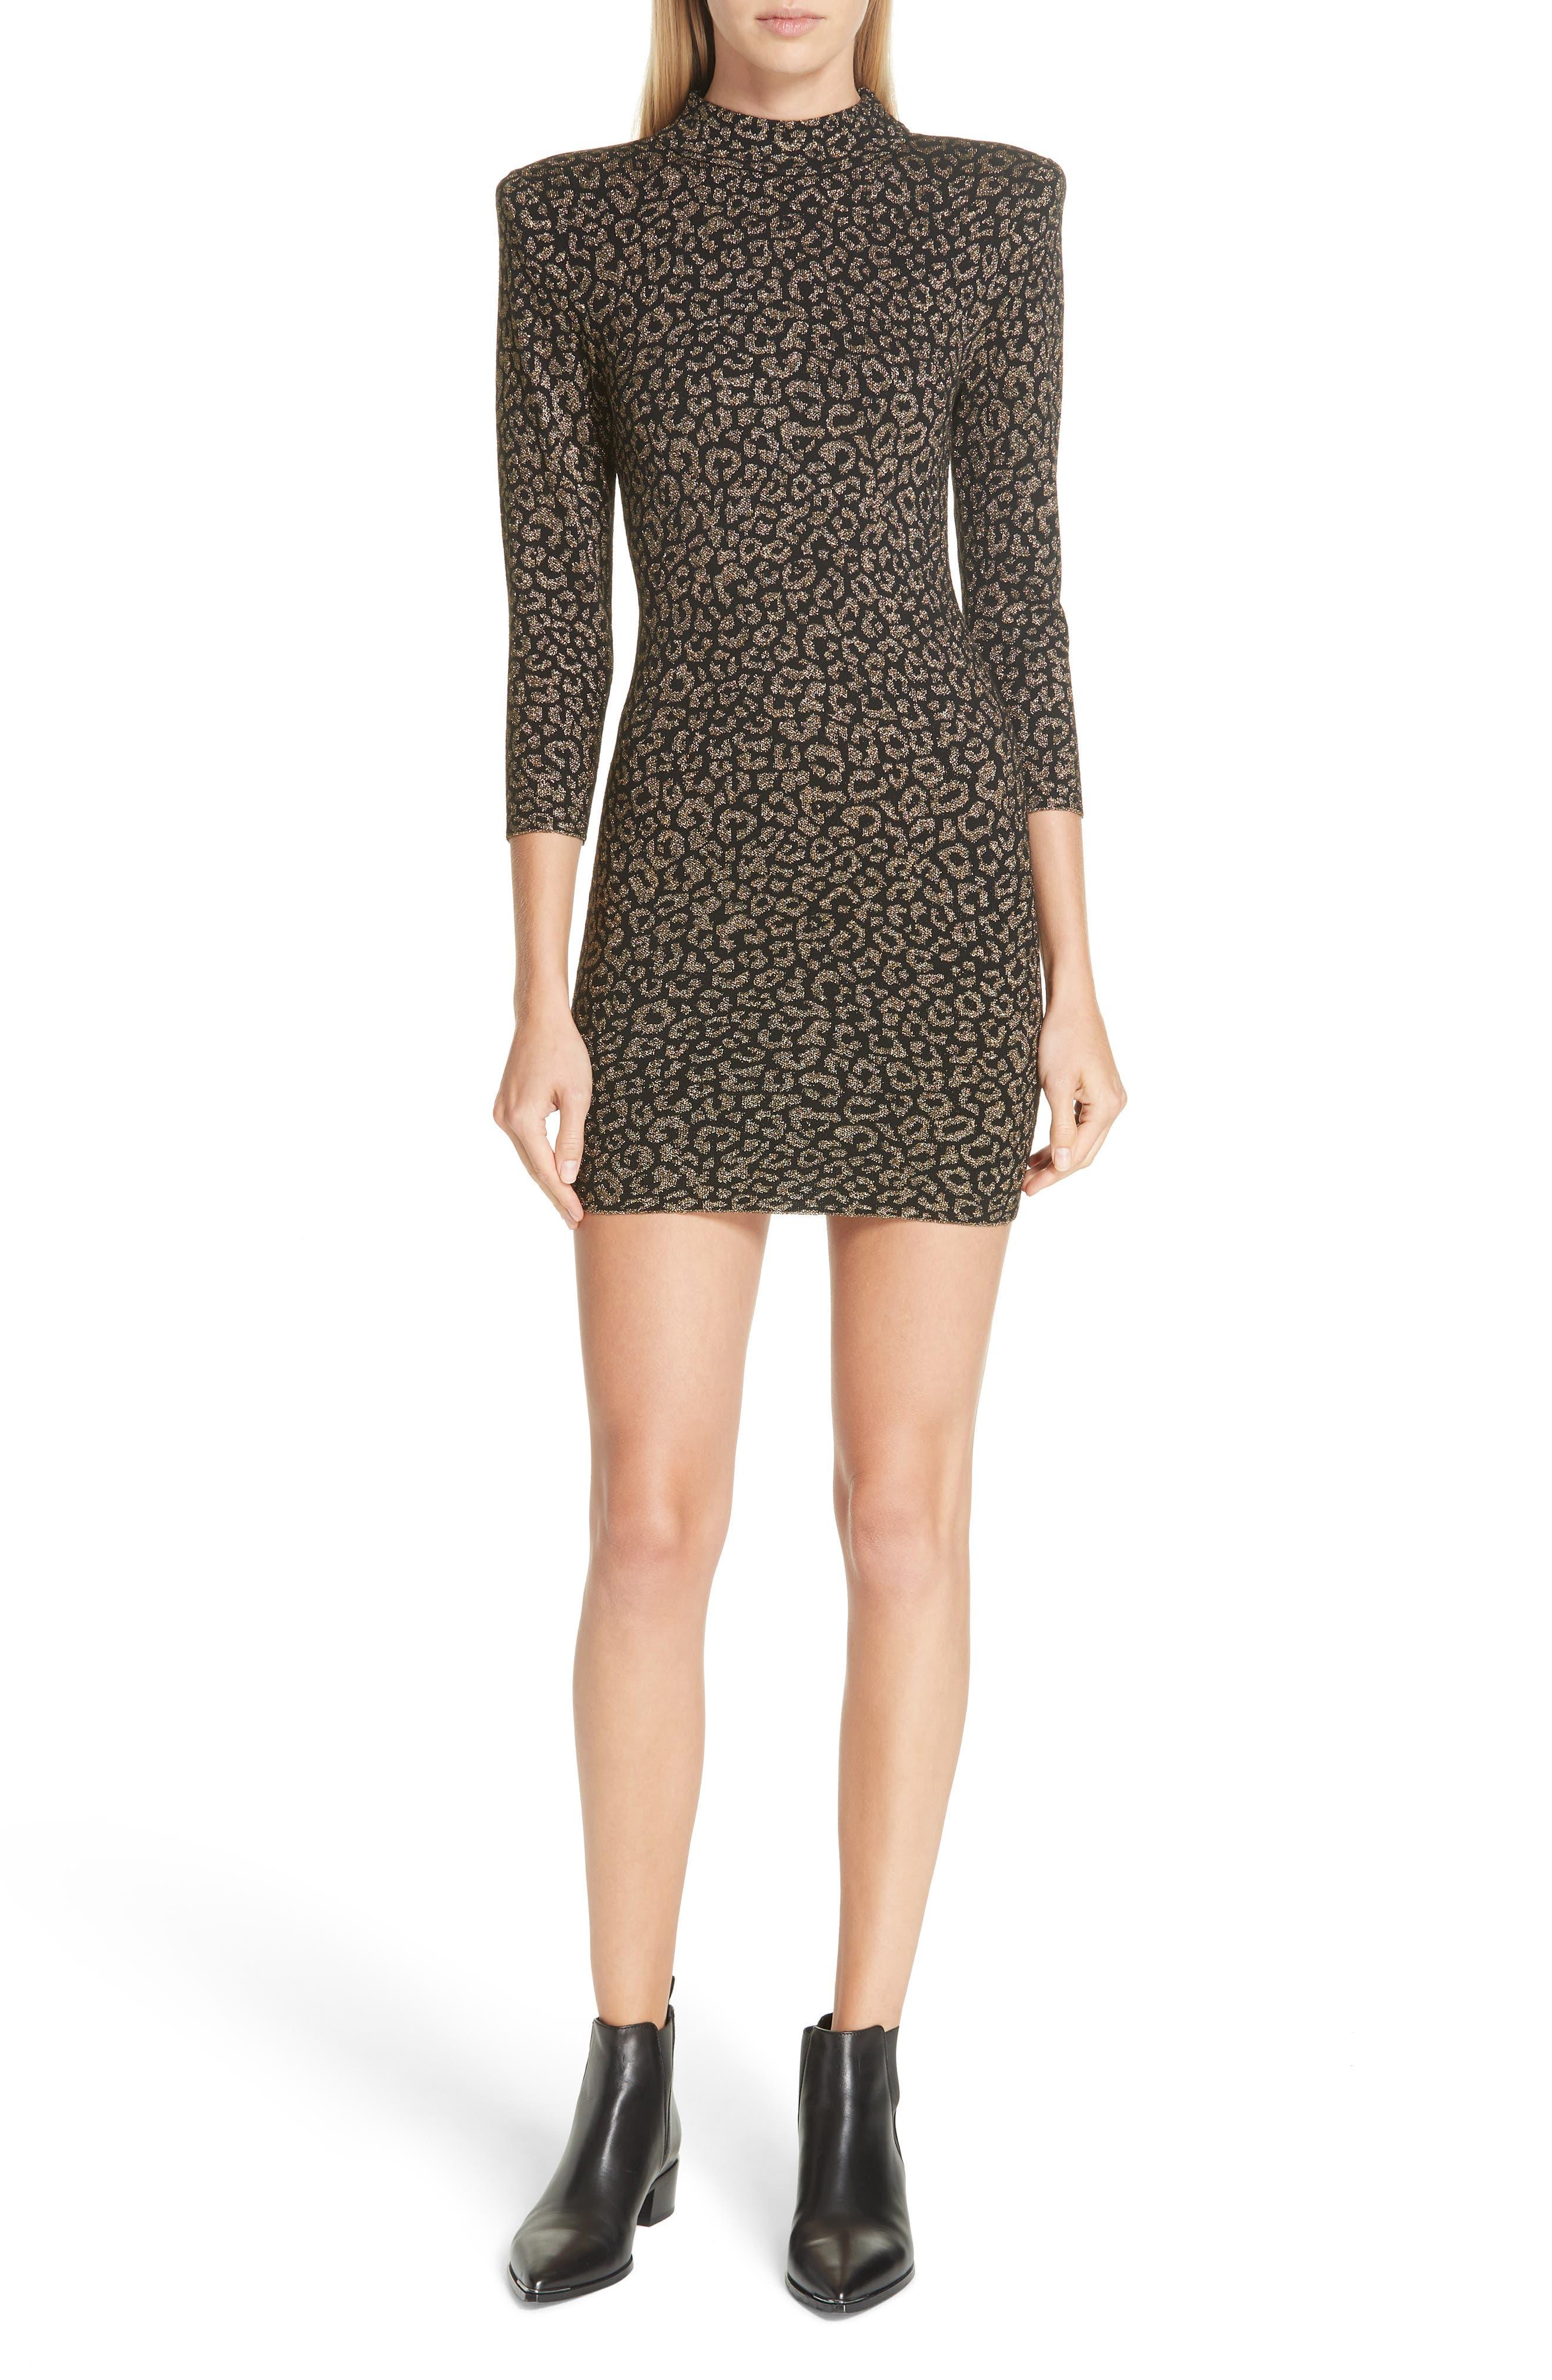 A.l.c. Mahry Metallic Leopard Print Dress